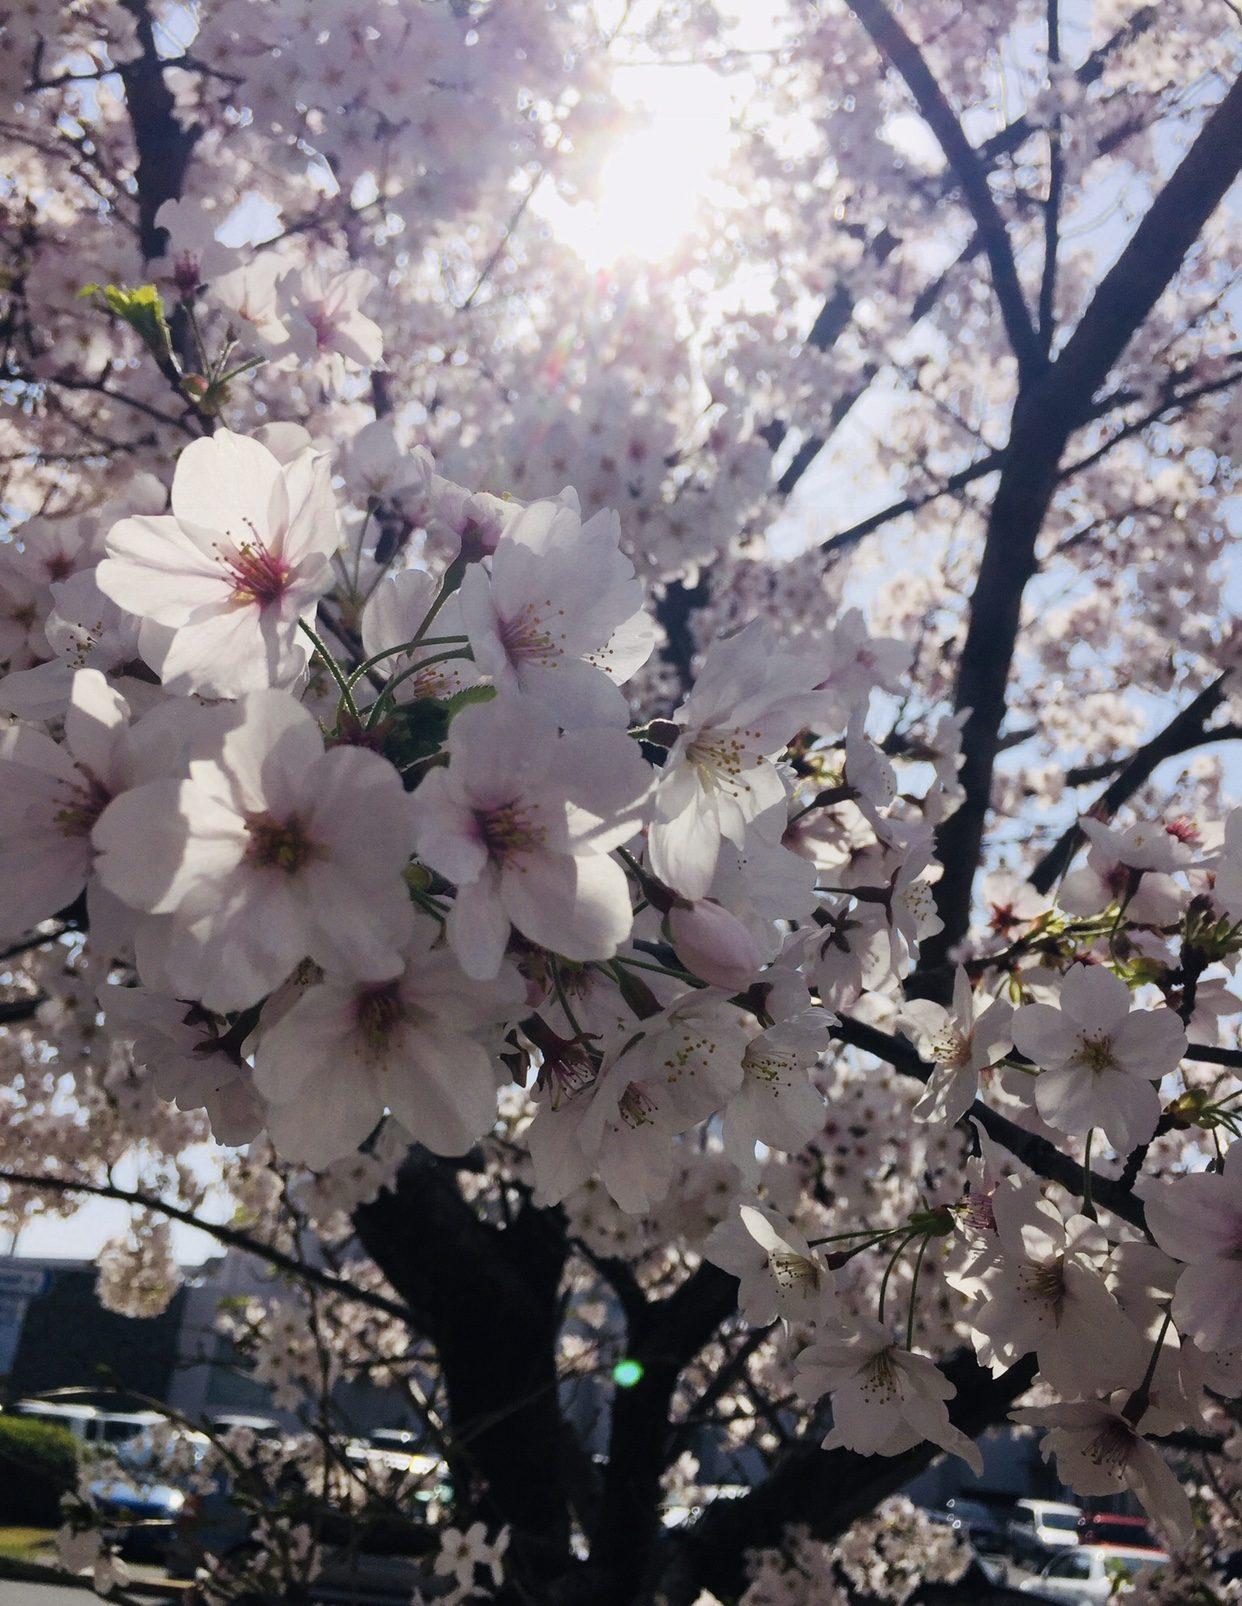 Chet Santos – Take on Commander. Fleet Activites Yokosuka. Take a minute to enjoy the cherry blossoms while the sun shines on you.